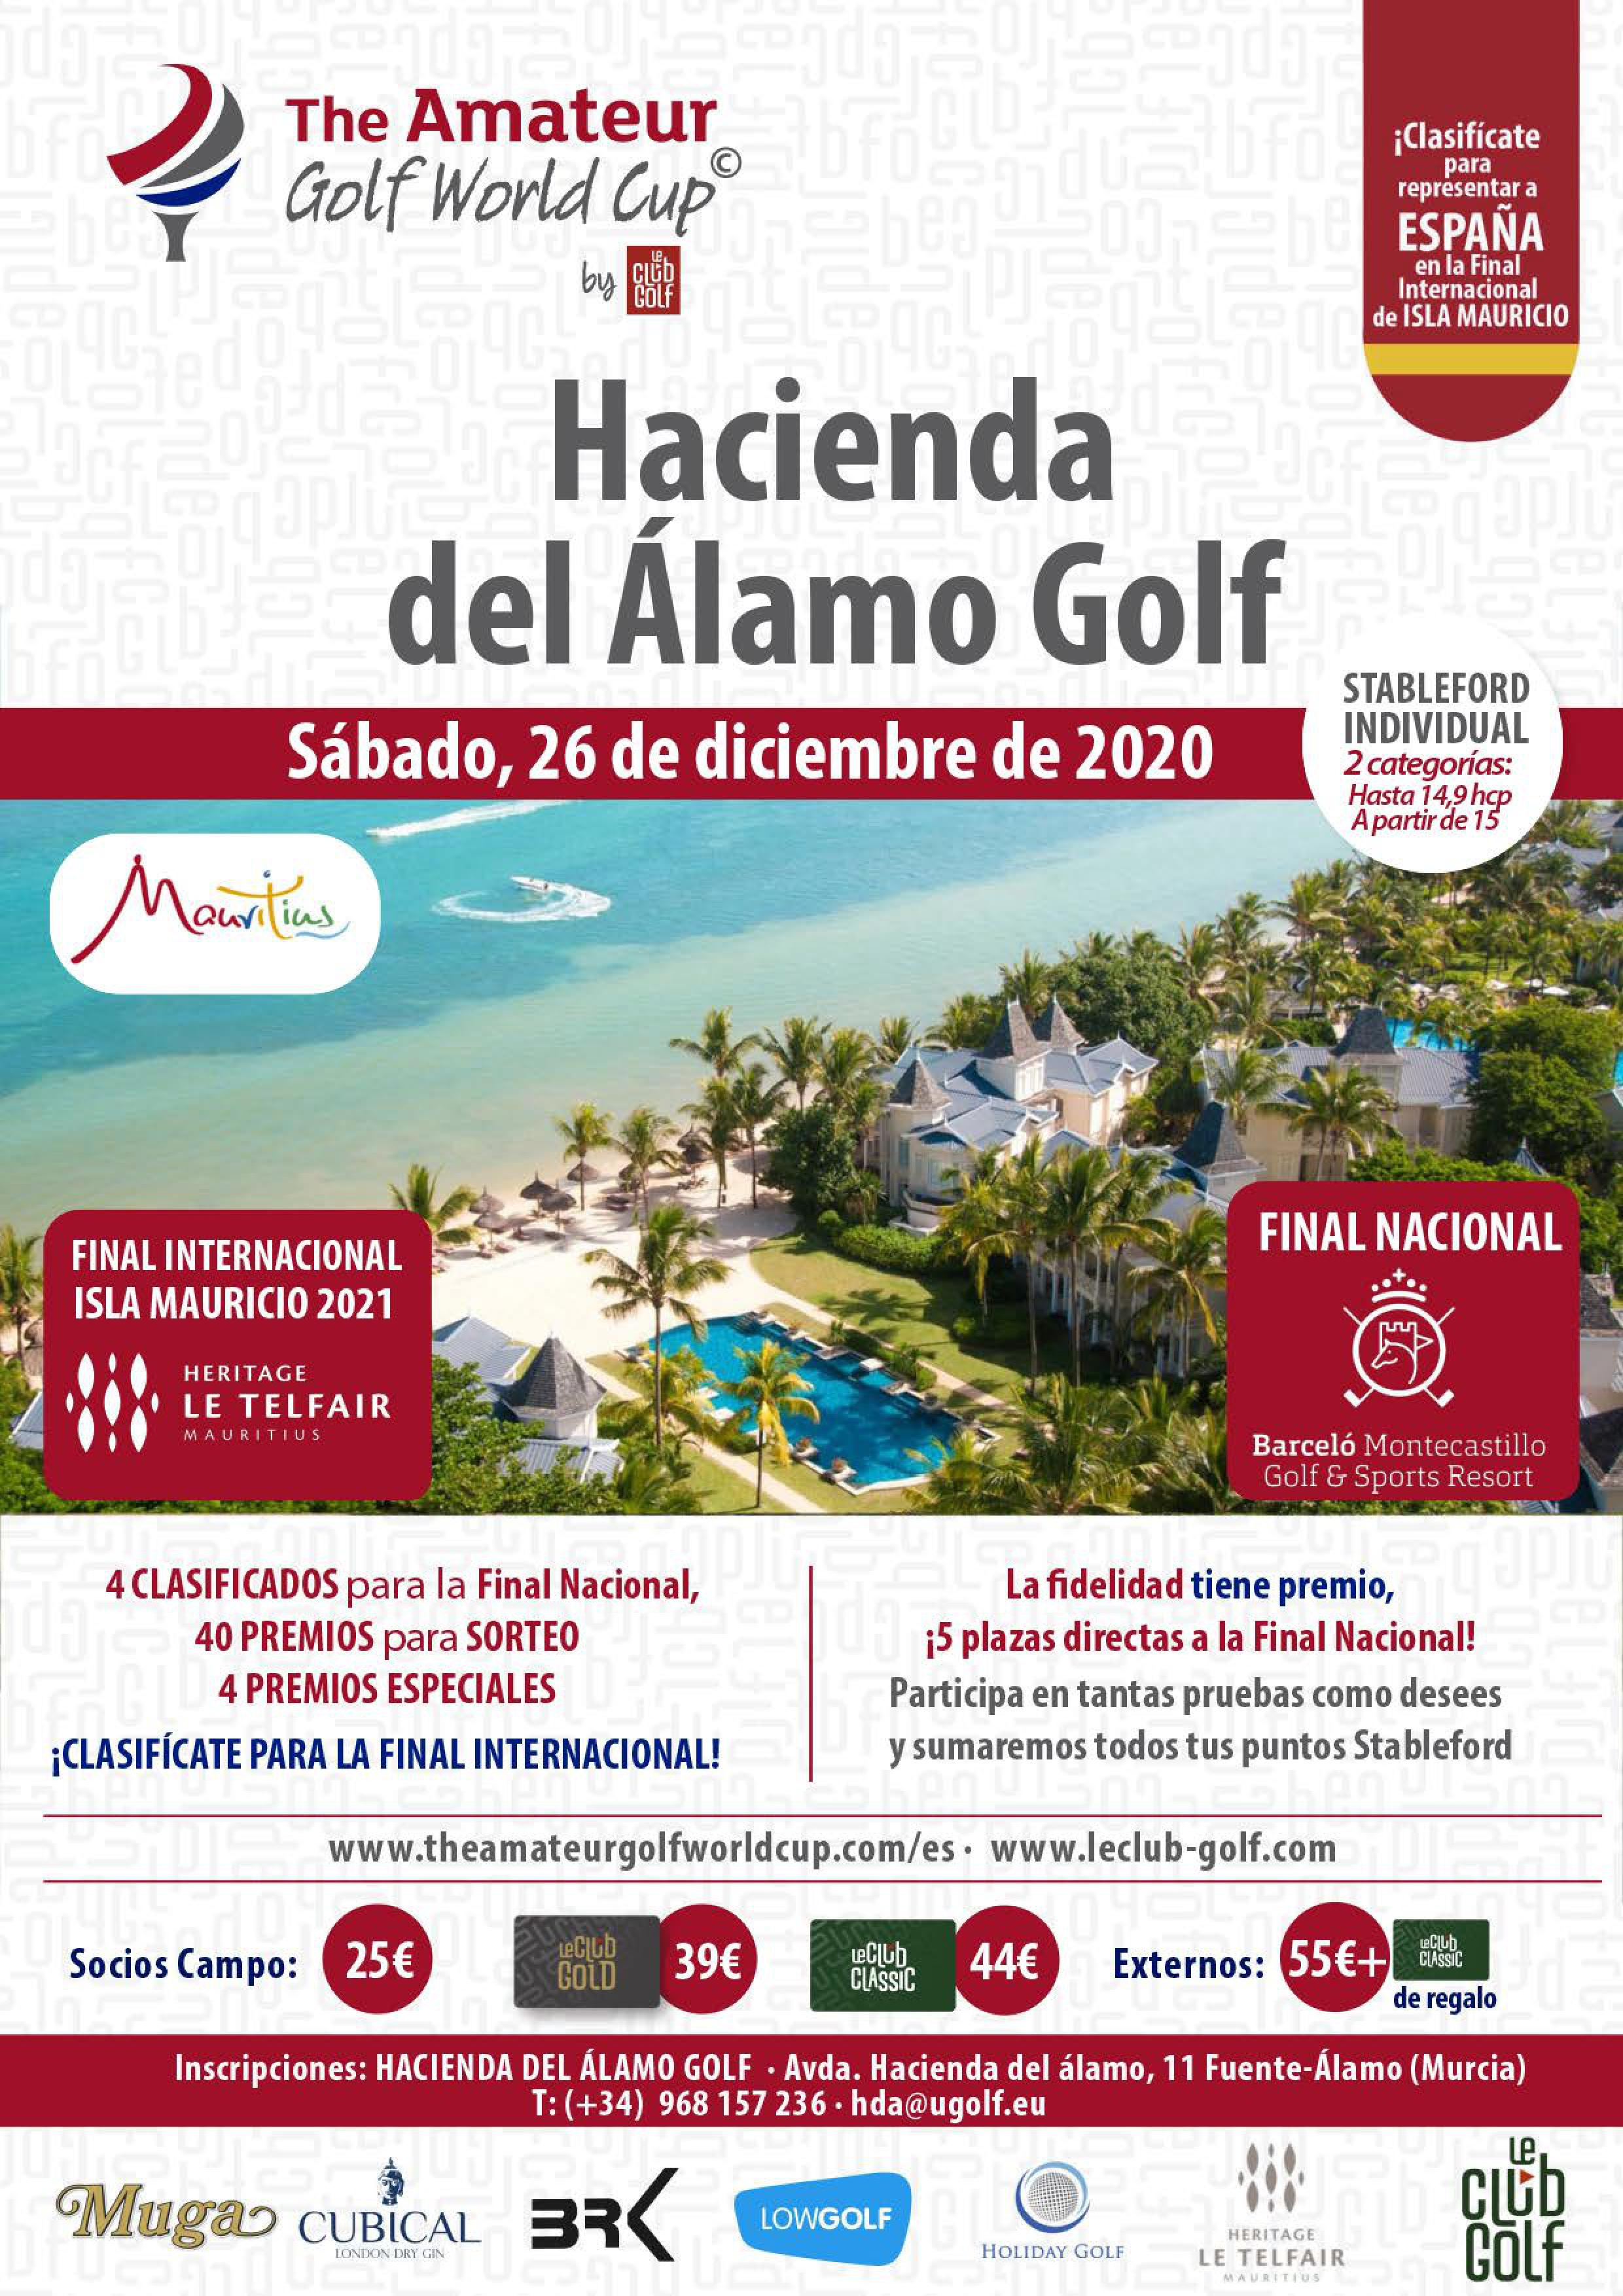 201226 HDA, Cartel del torneo